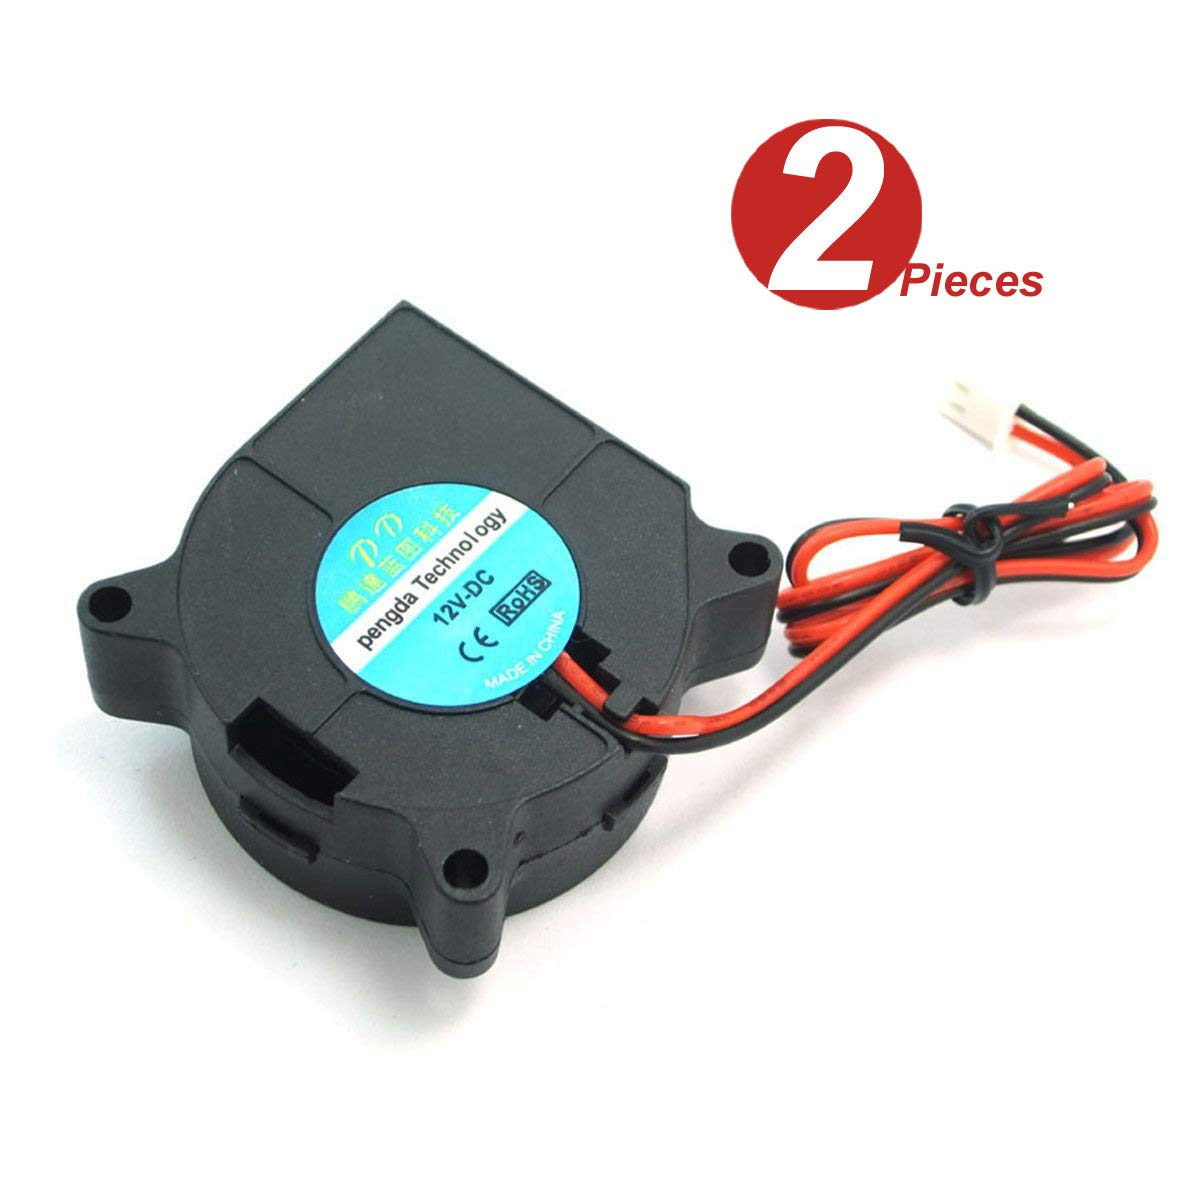 DollaTek 2Pcs ventilador de refrigeración de la impresora 3D DC ...